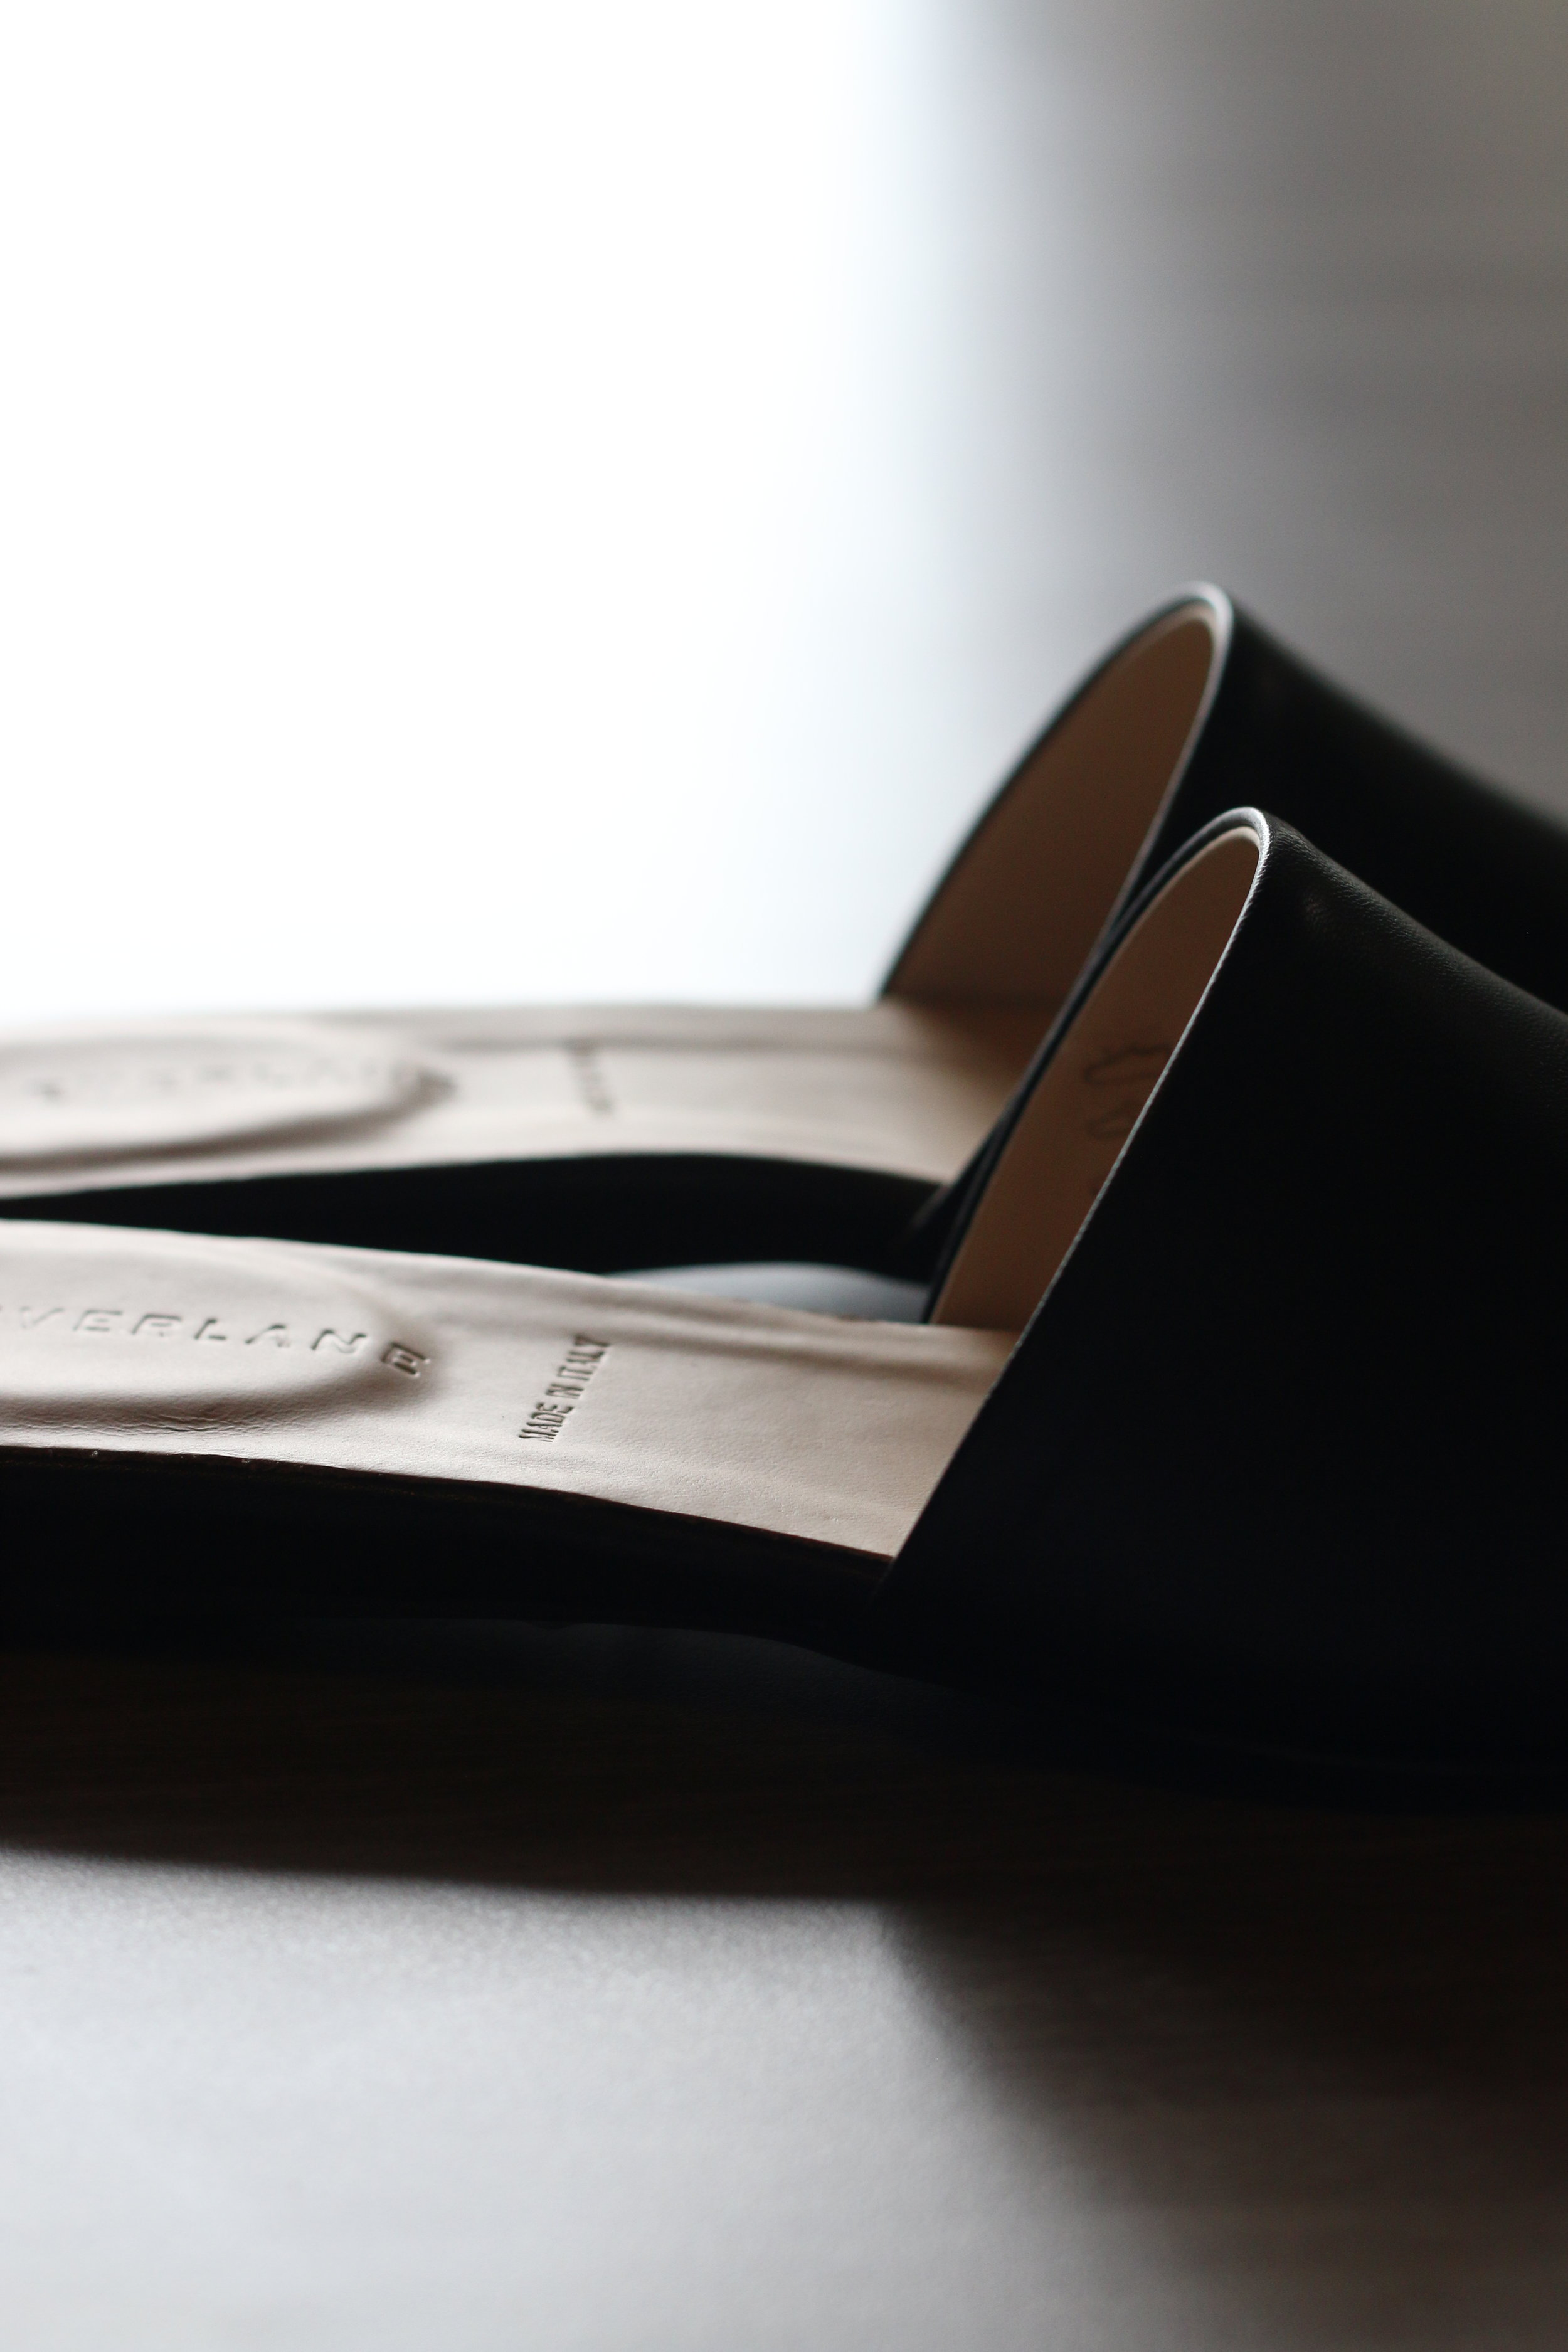 everlane shoes.JPG